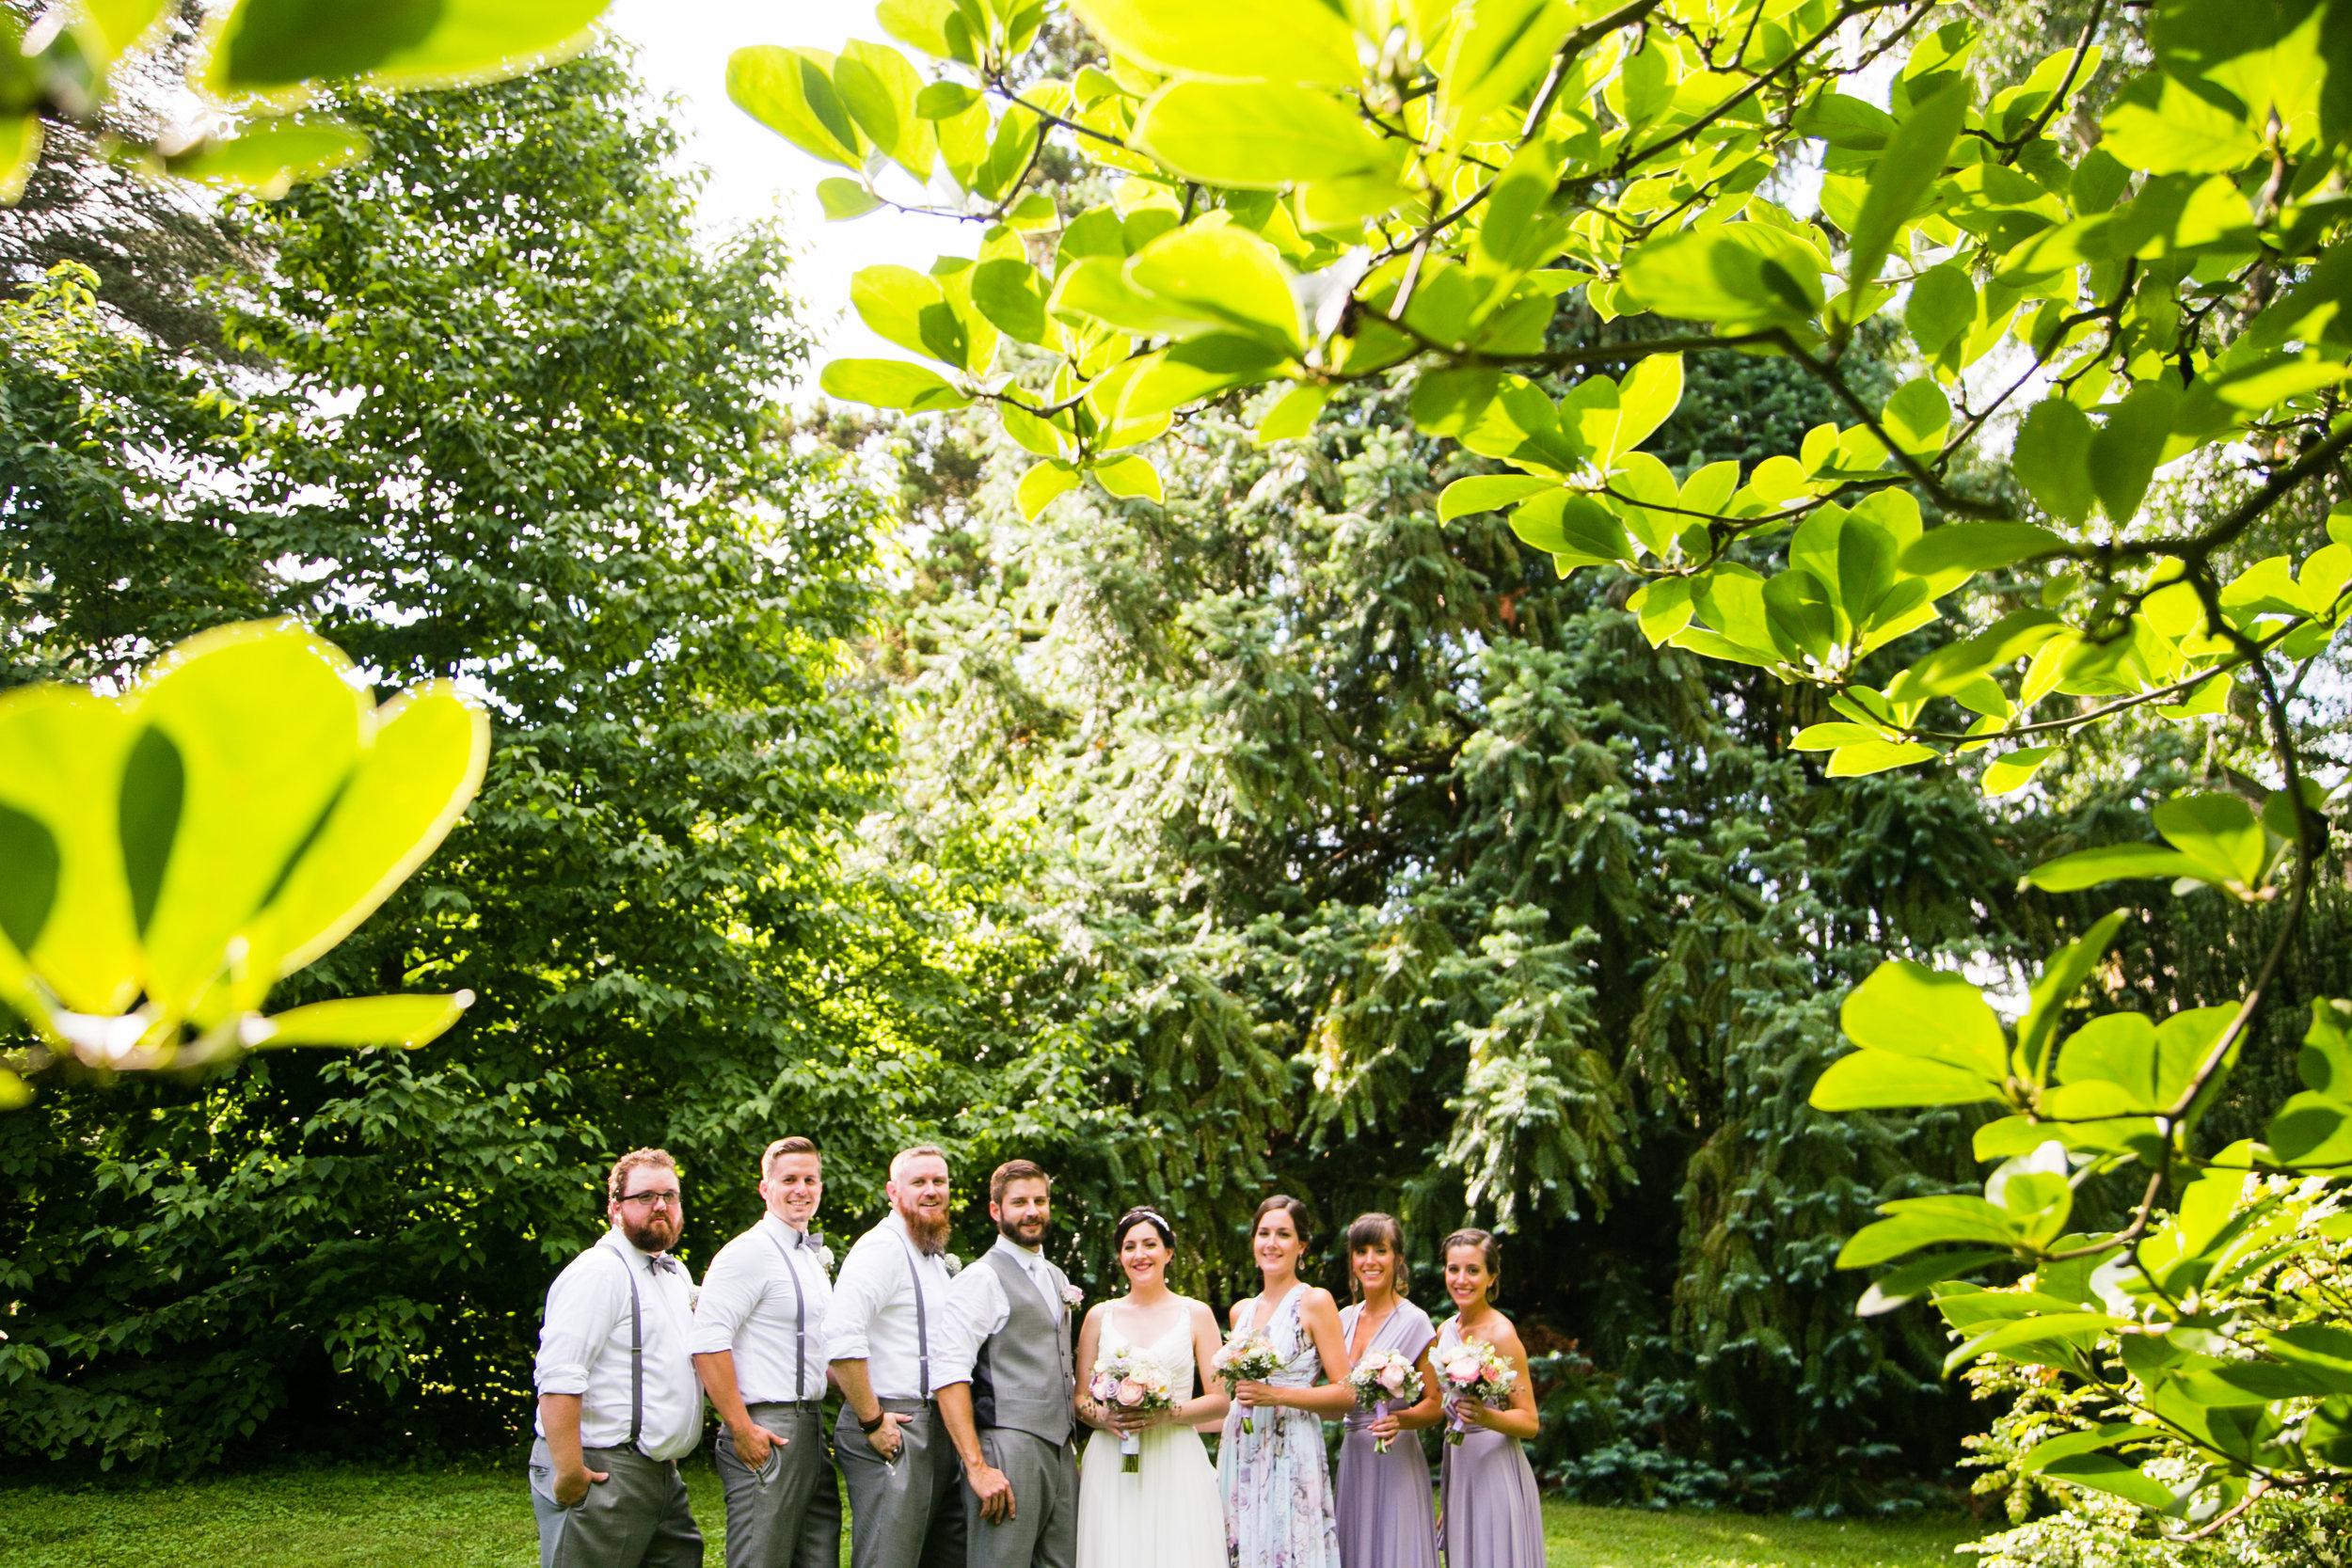 TYLER ARBORETUM WEDDING PHOTOGRAPHY LOVESTRUCK PICTURES-030.jpg